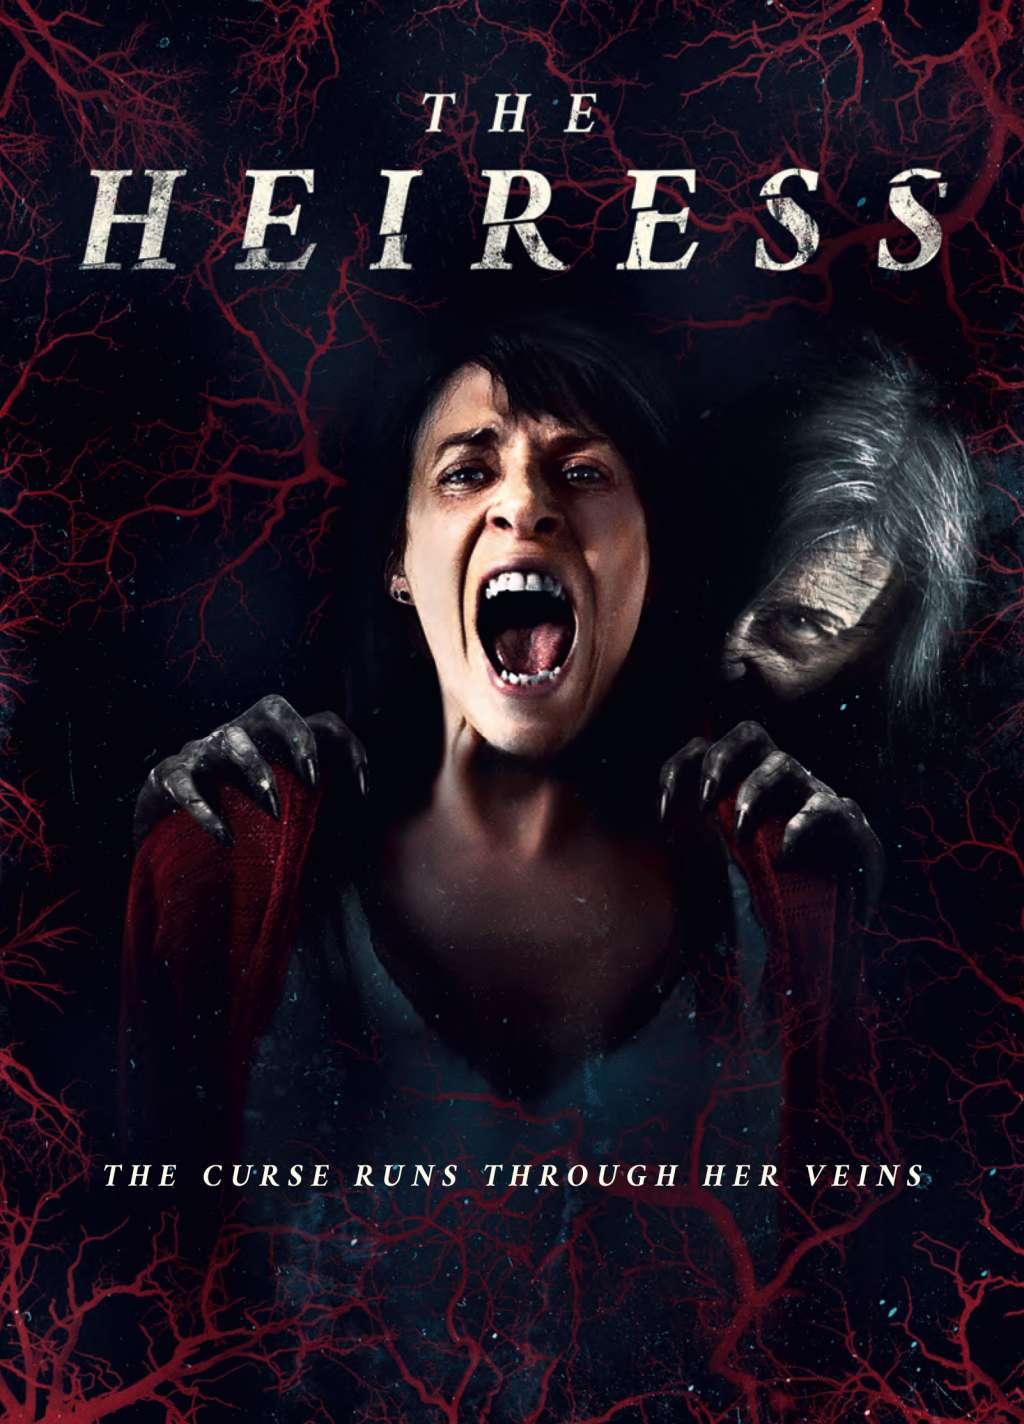 The Heiress kapak